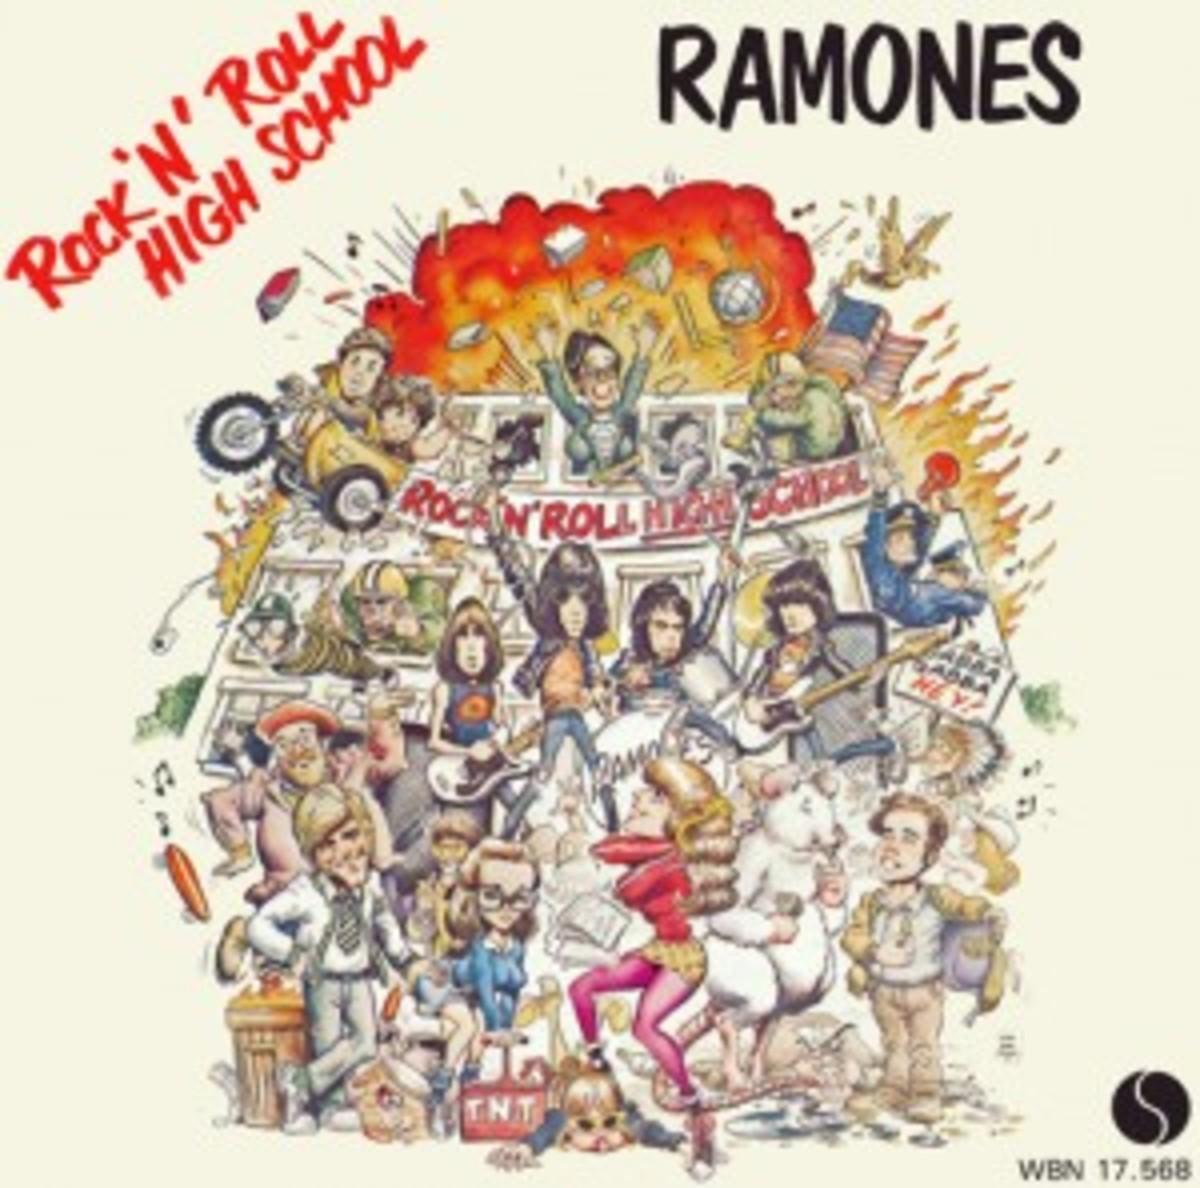 The Ramones Rock 'n' Roll High School picture sleeve